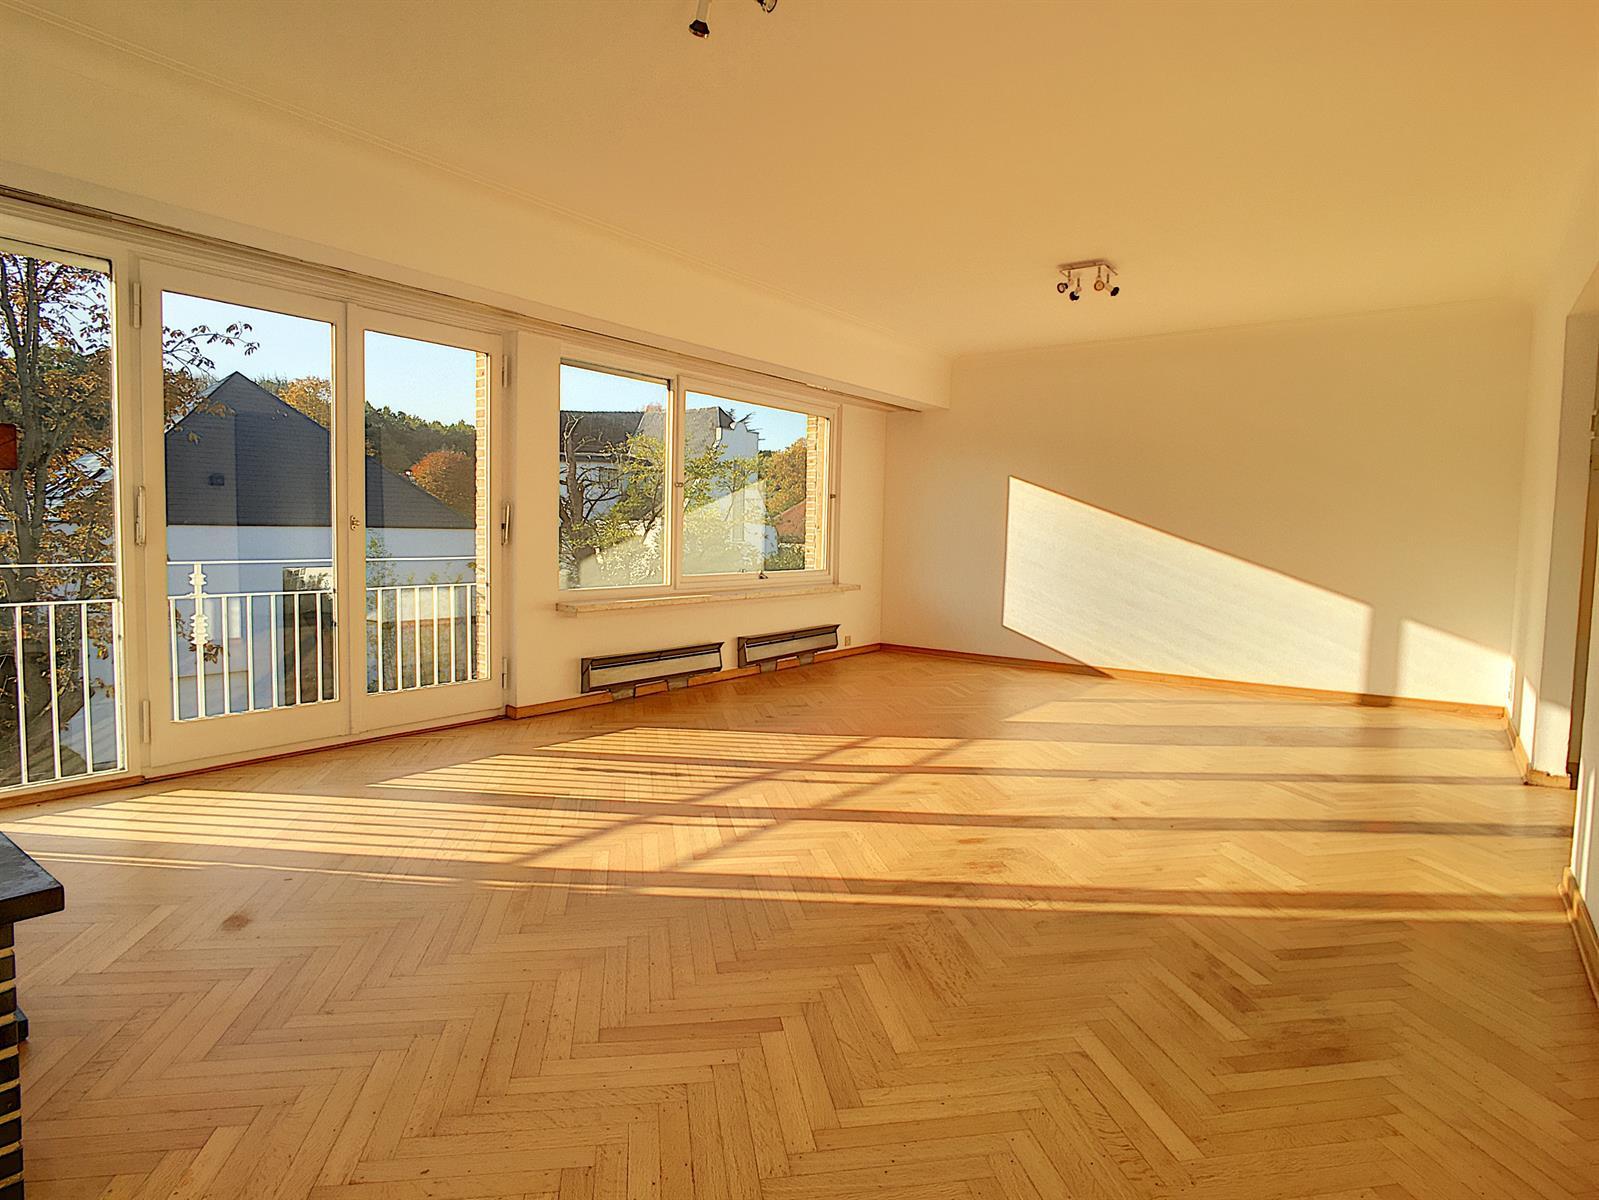 Appartement - Auderghem - #4197560-2